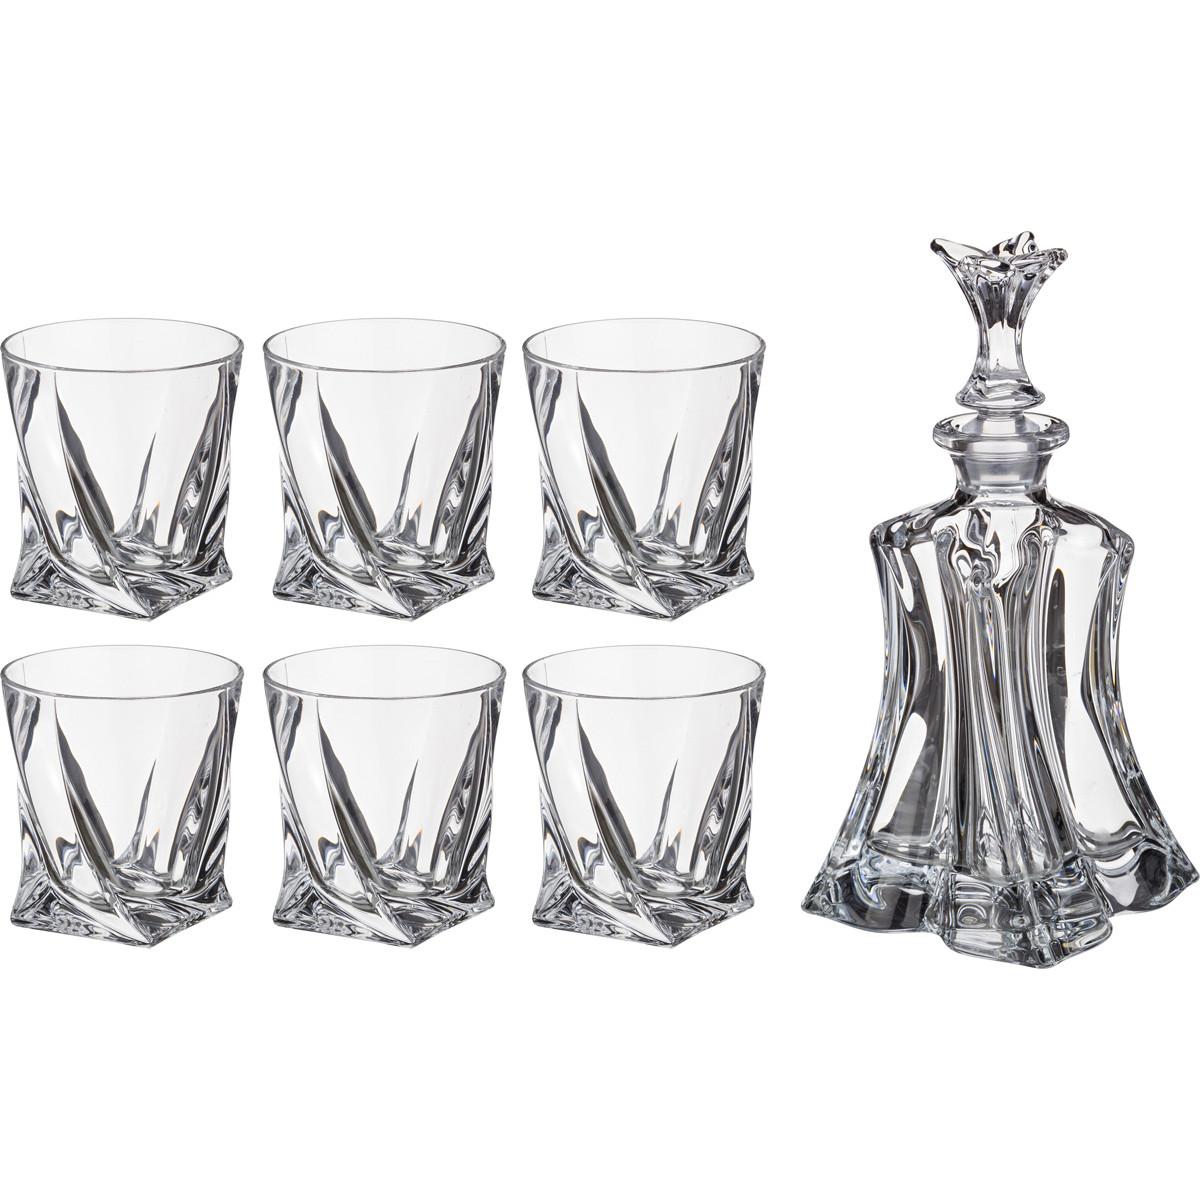 {} Crystalite Bohemia Набор для виски Lewin  (Набор) набор для виски 7 предметов bohemia набор для виски 7 предметов